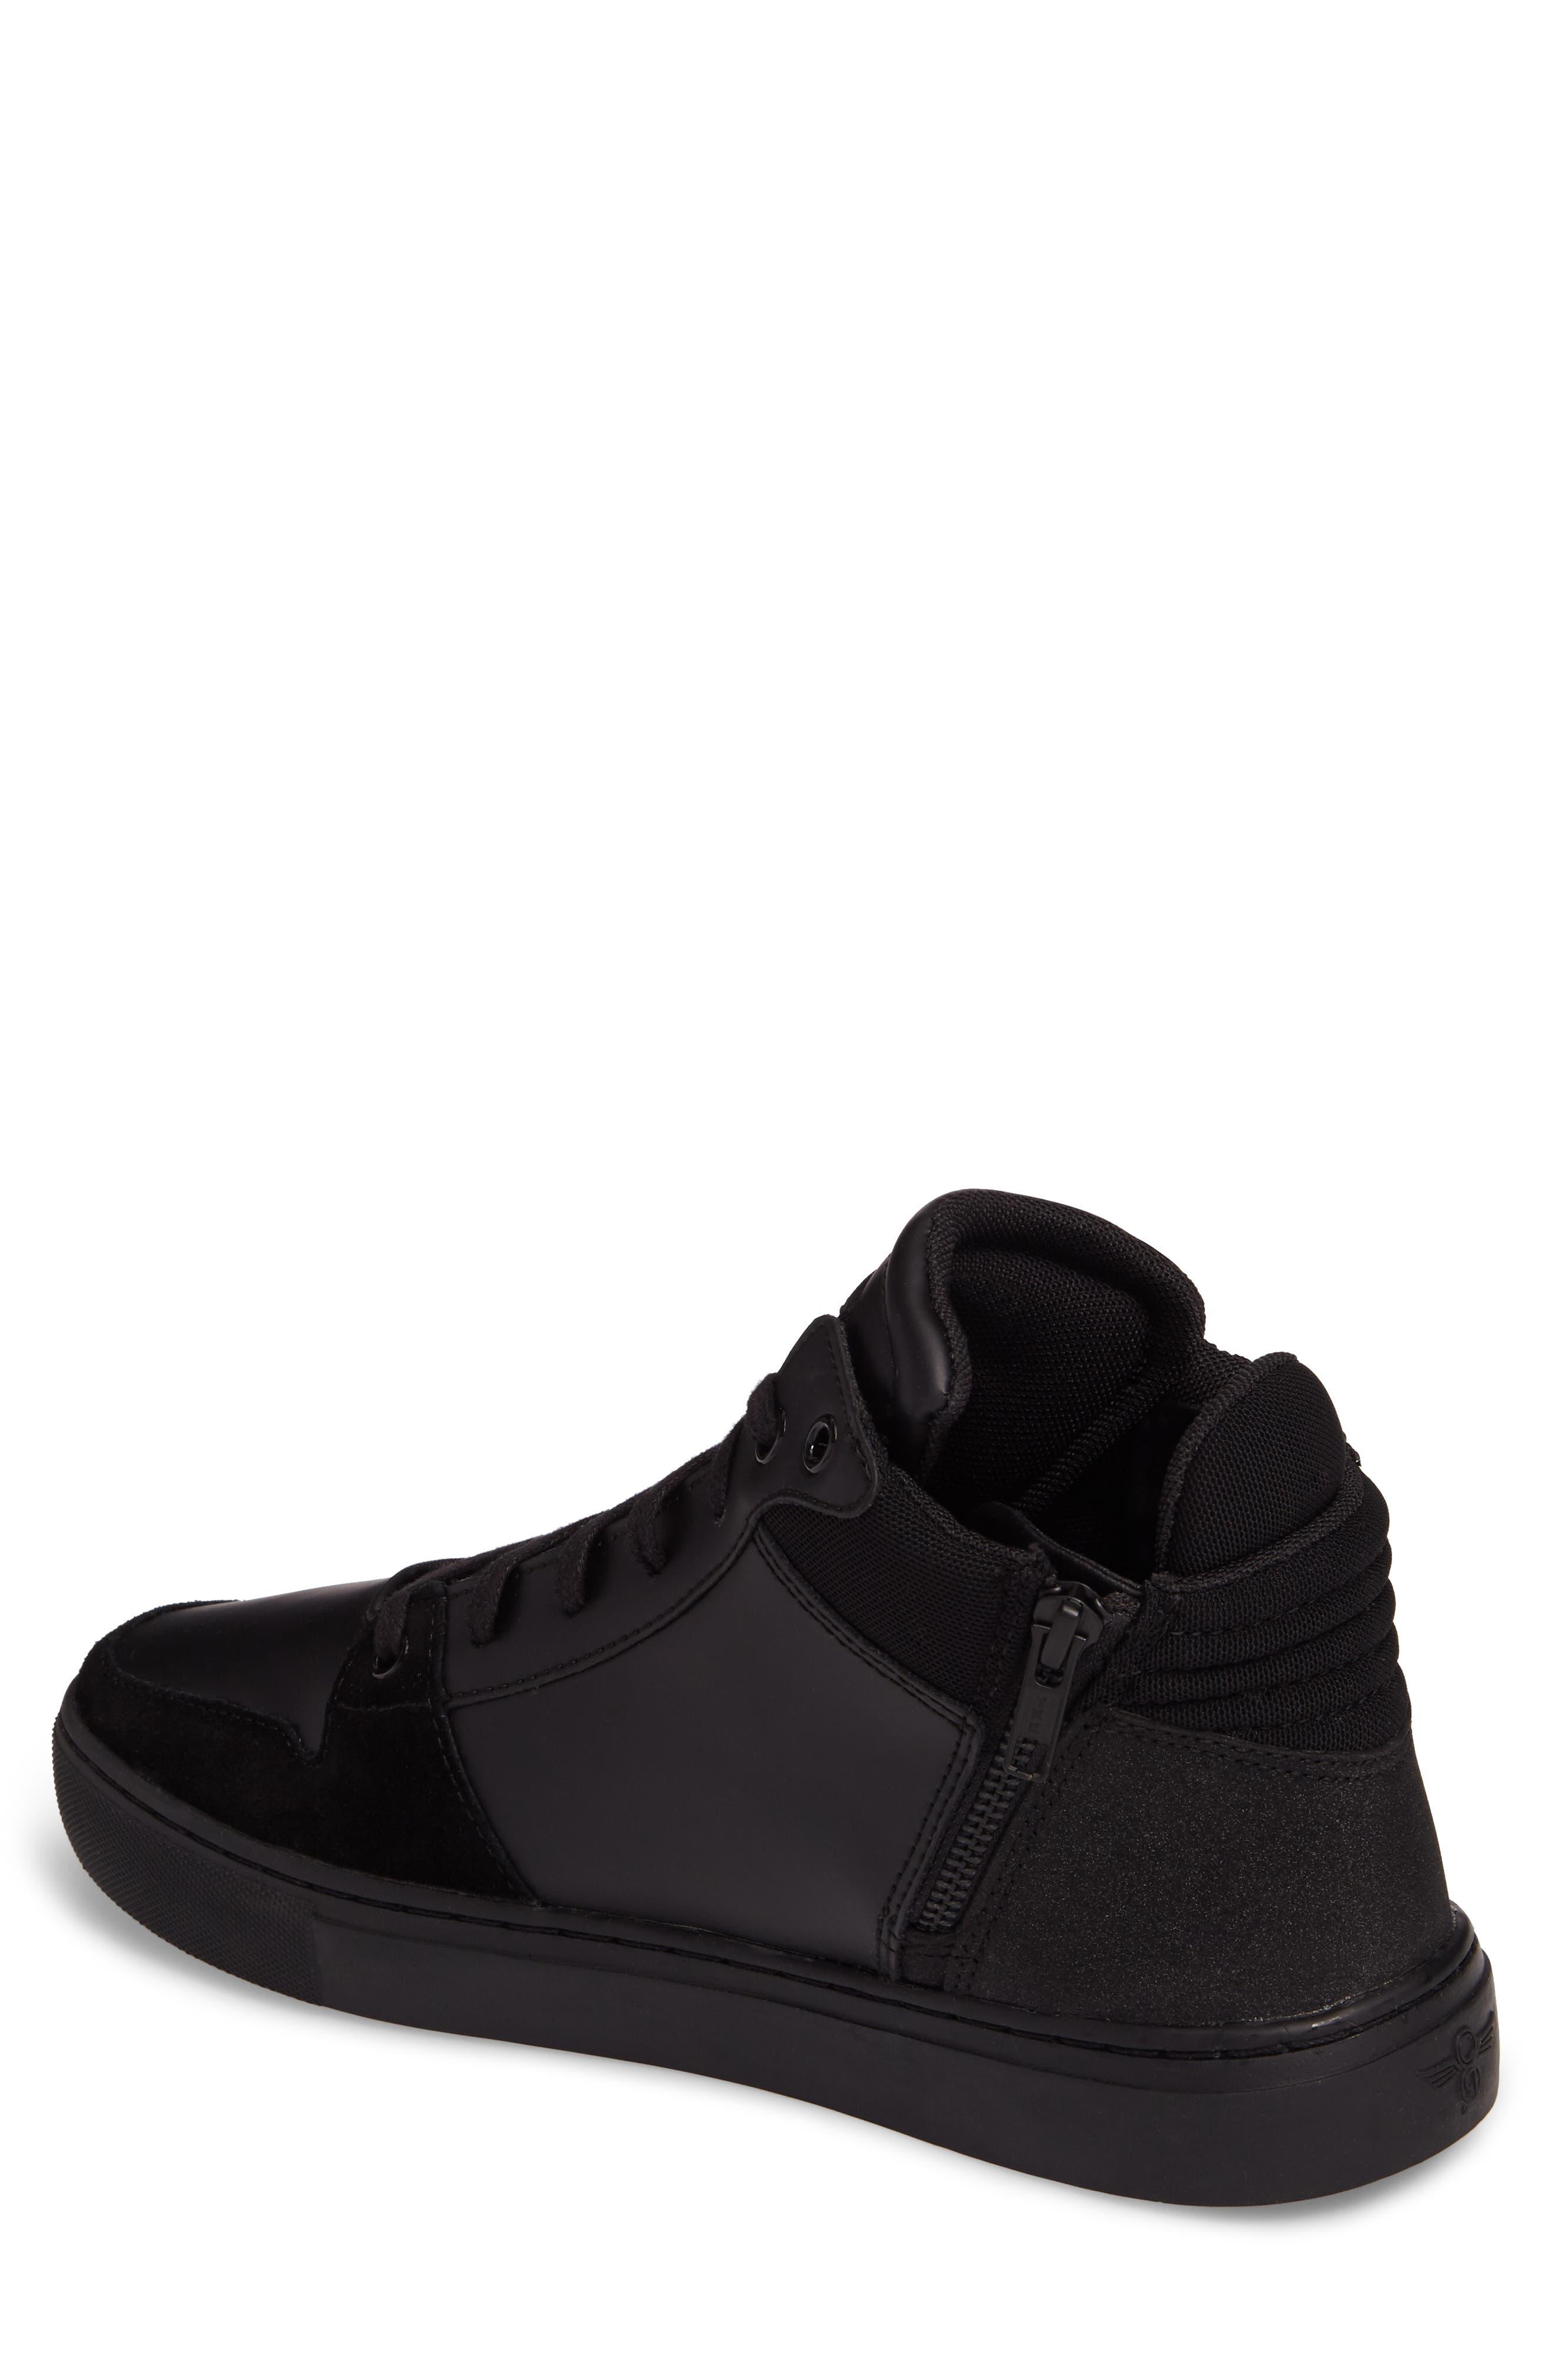 Modena Sneaker,                             Alternate thumbnail 2, color,                             Black Tech